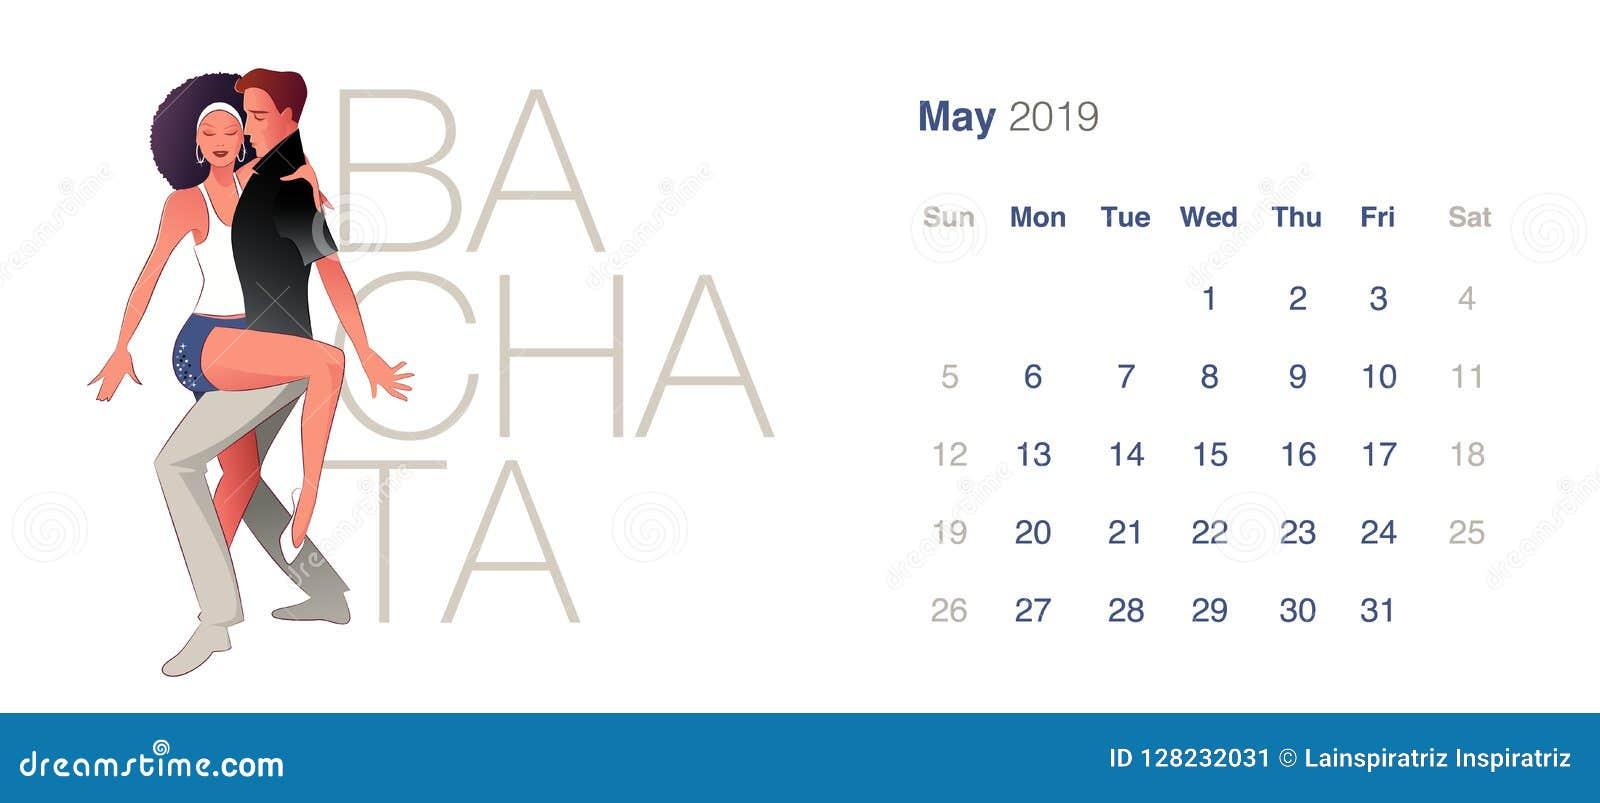 2019 Dance Calendar. May. Young couple dancing sensual Bachata